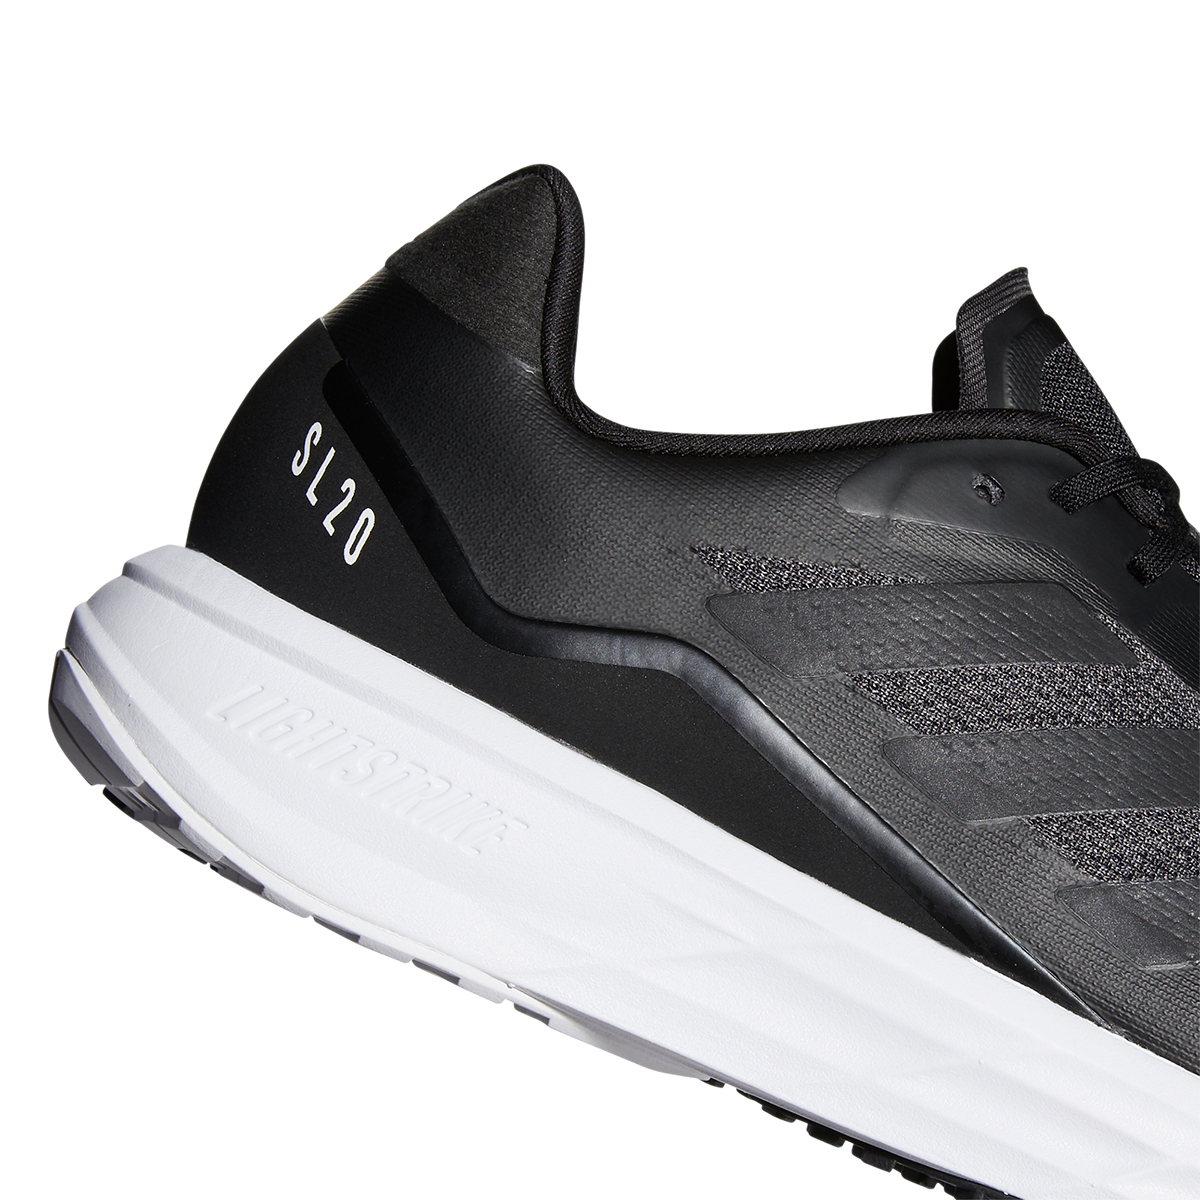 Men's Adidas SL20.2 Running Shoe - Color: Core Black/Grey - Size: 6.5 - Width: Regular, Core Black/Grey, large, image 4